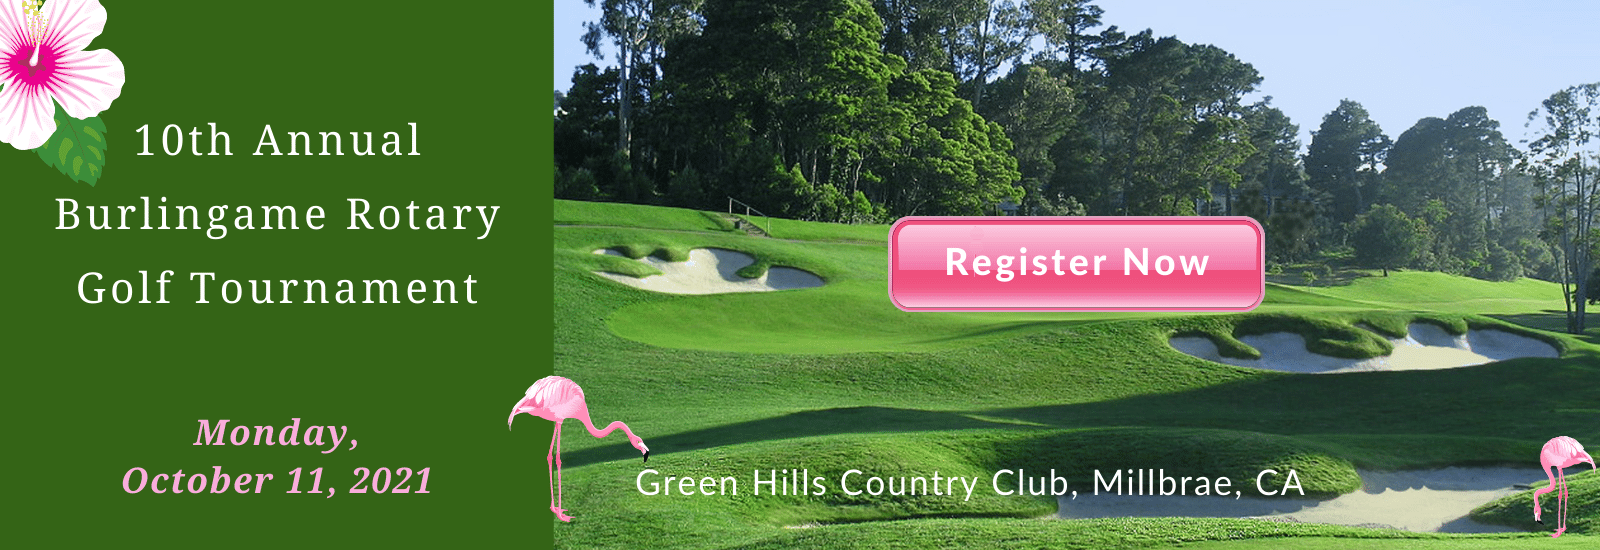 10th Annual Burlingame Rotary Golf Tournament